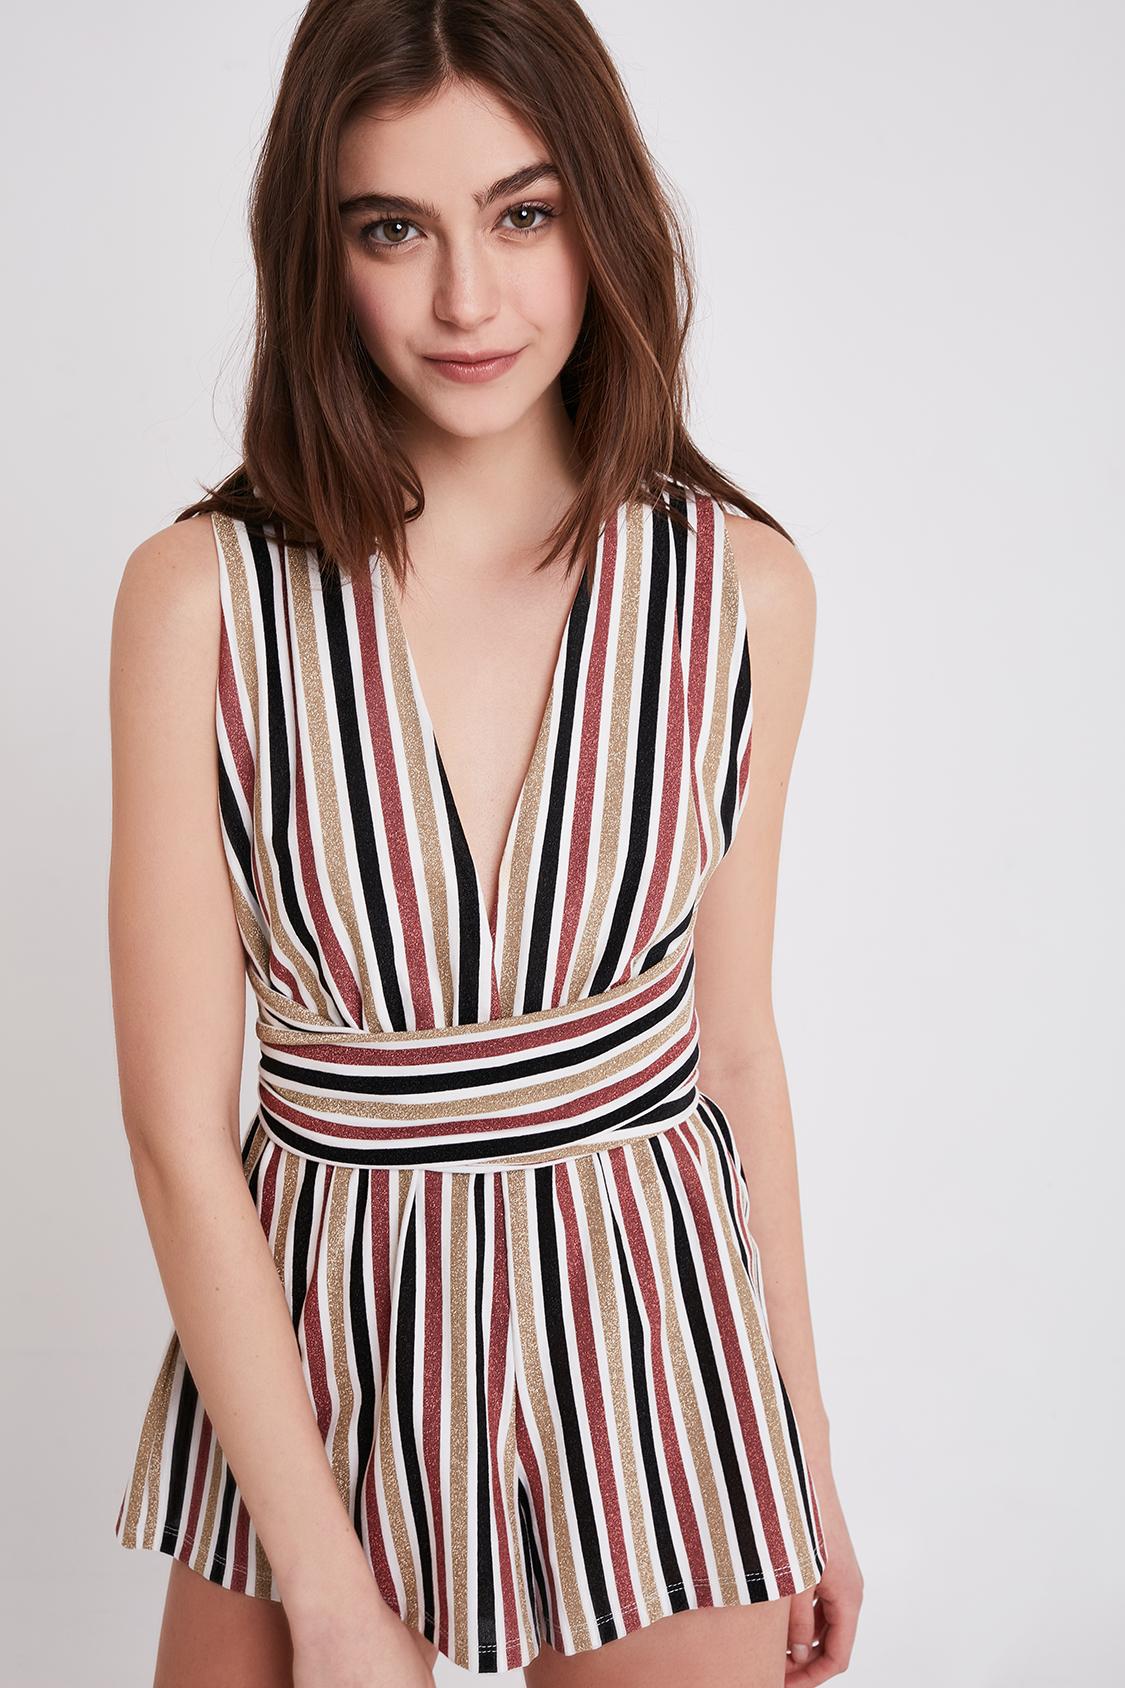 Striped V-neck playsuit